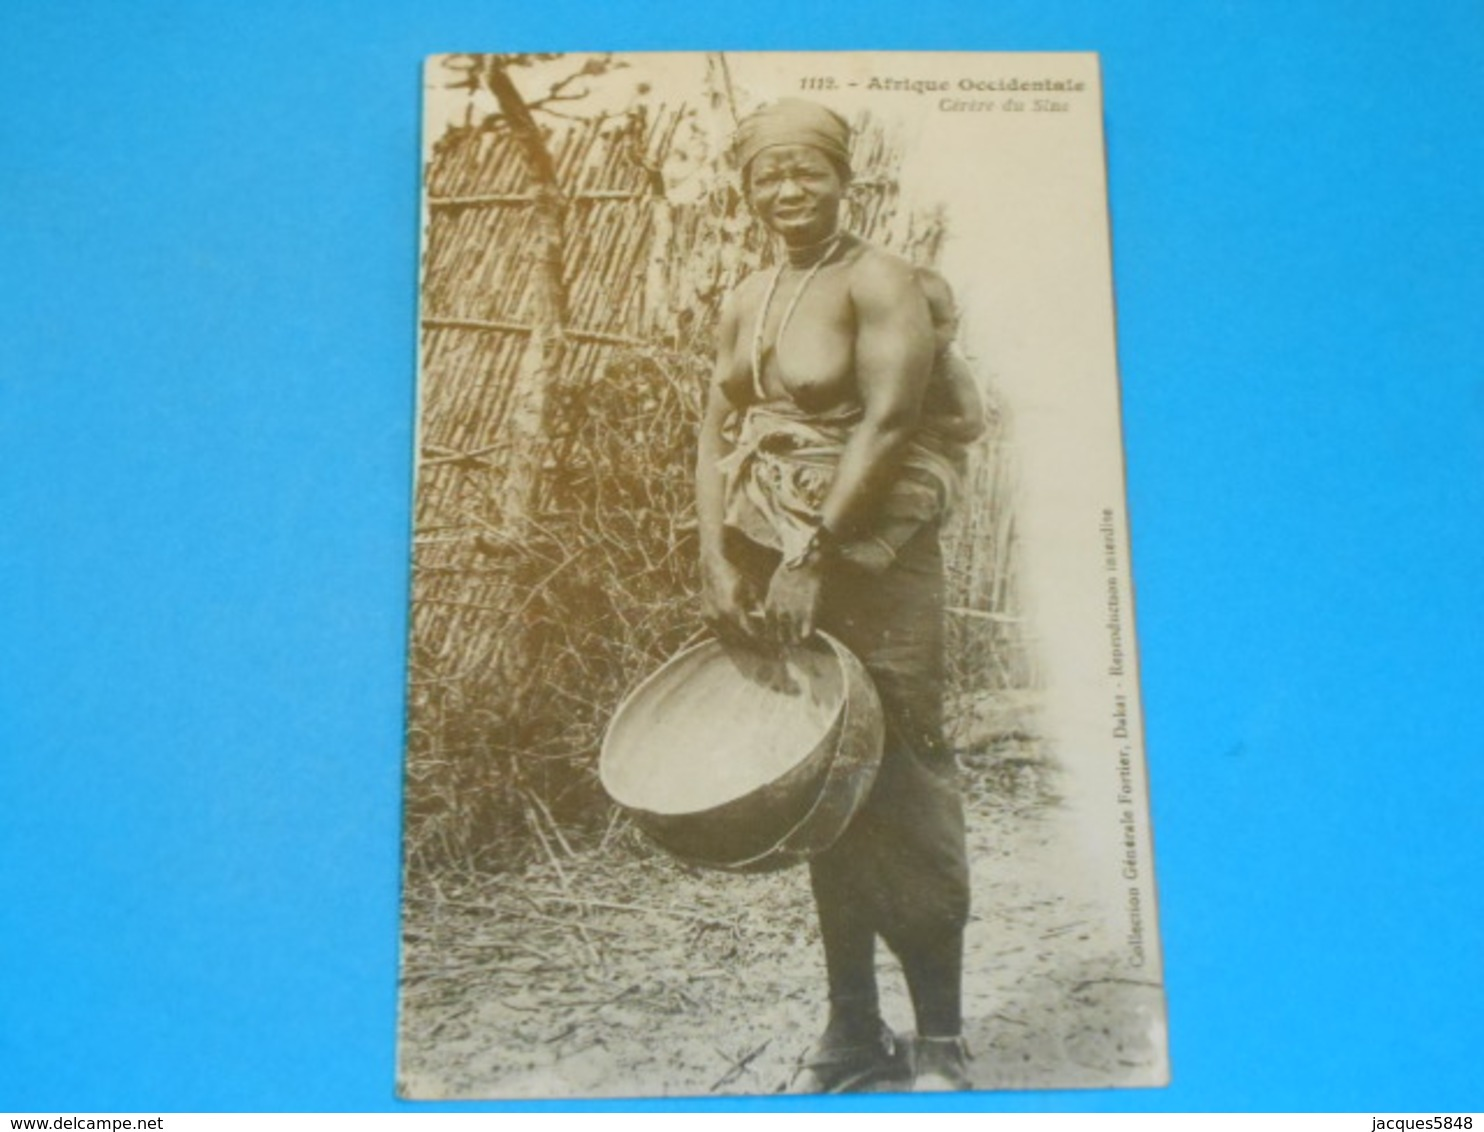 Nus ) Afrique Occidentale - Cérére Du Sine - N° 1112 -  Année  - EDIT - Fortier - South, East, West Africa